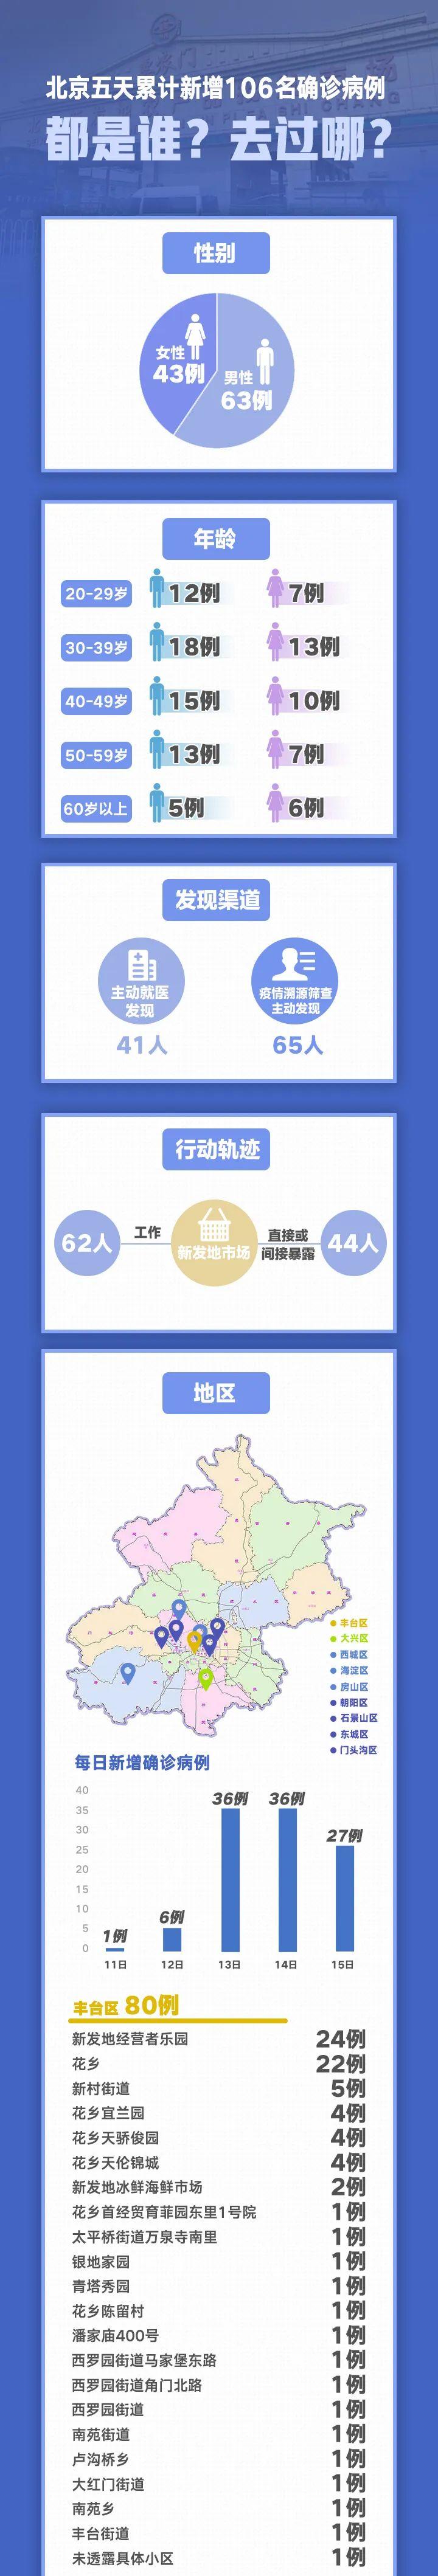 【lastpass怎么用】_北京5天新增106例:都是谁?去过哪?